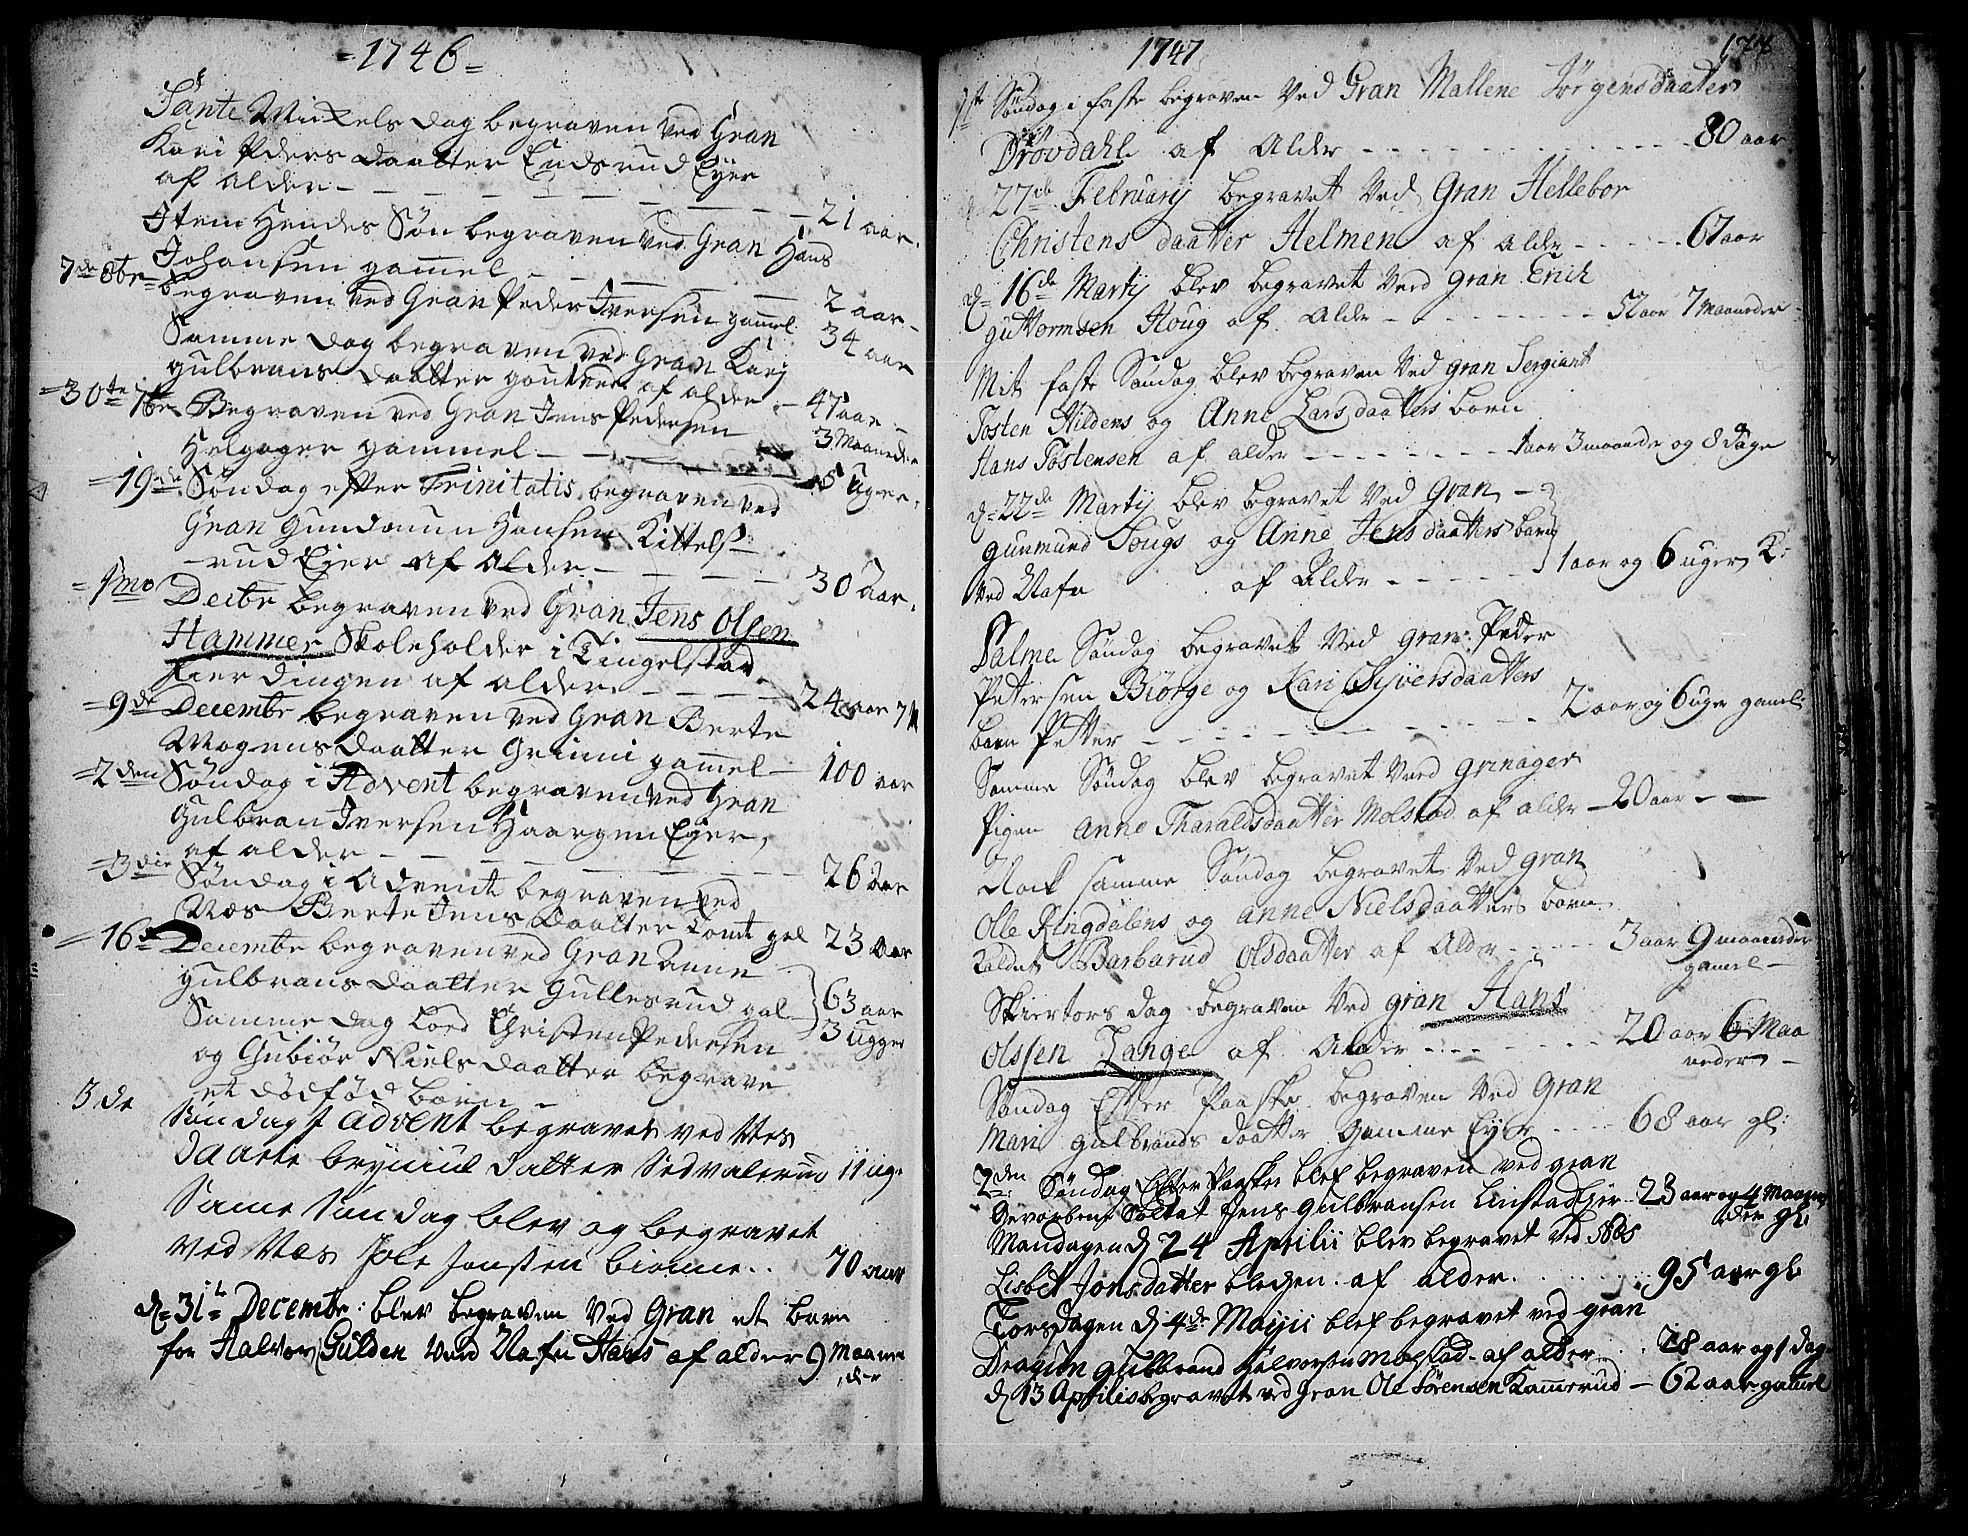 SAH, Gran prestekontor, Ministerialbok nr. 3, 1745-1758, s. 177